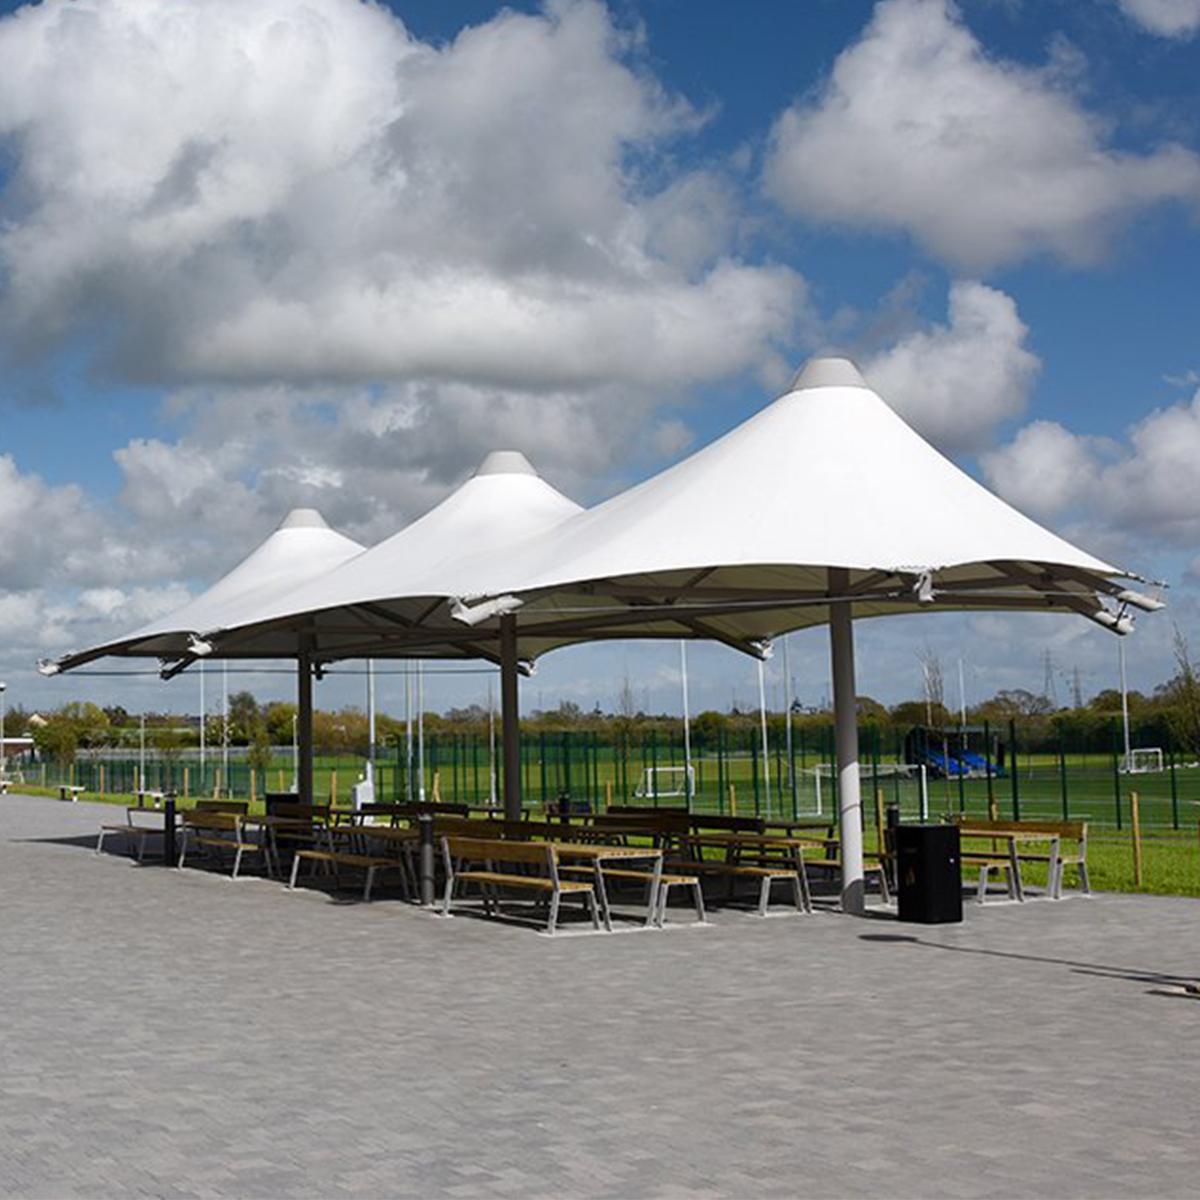 Triple Conic Canopy